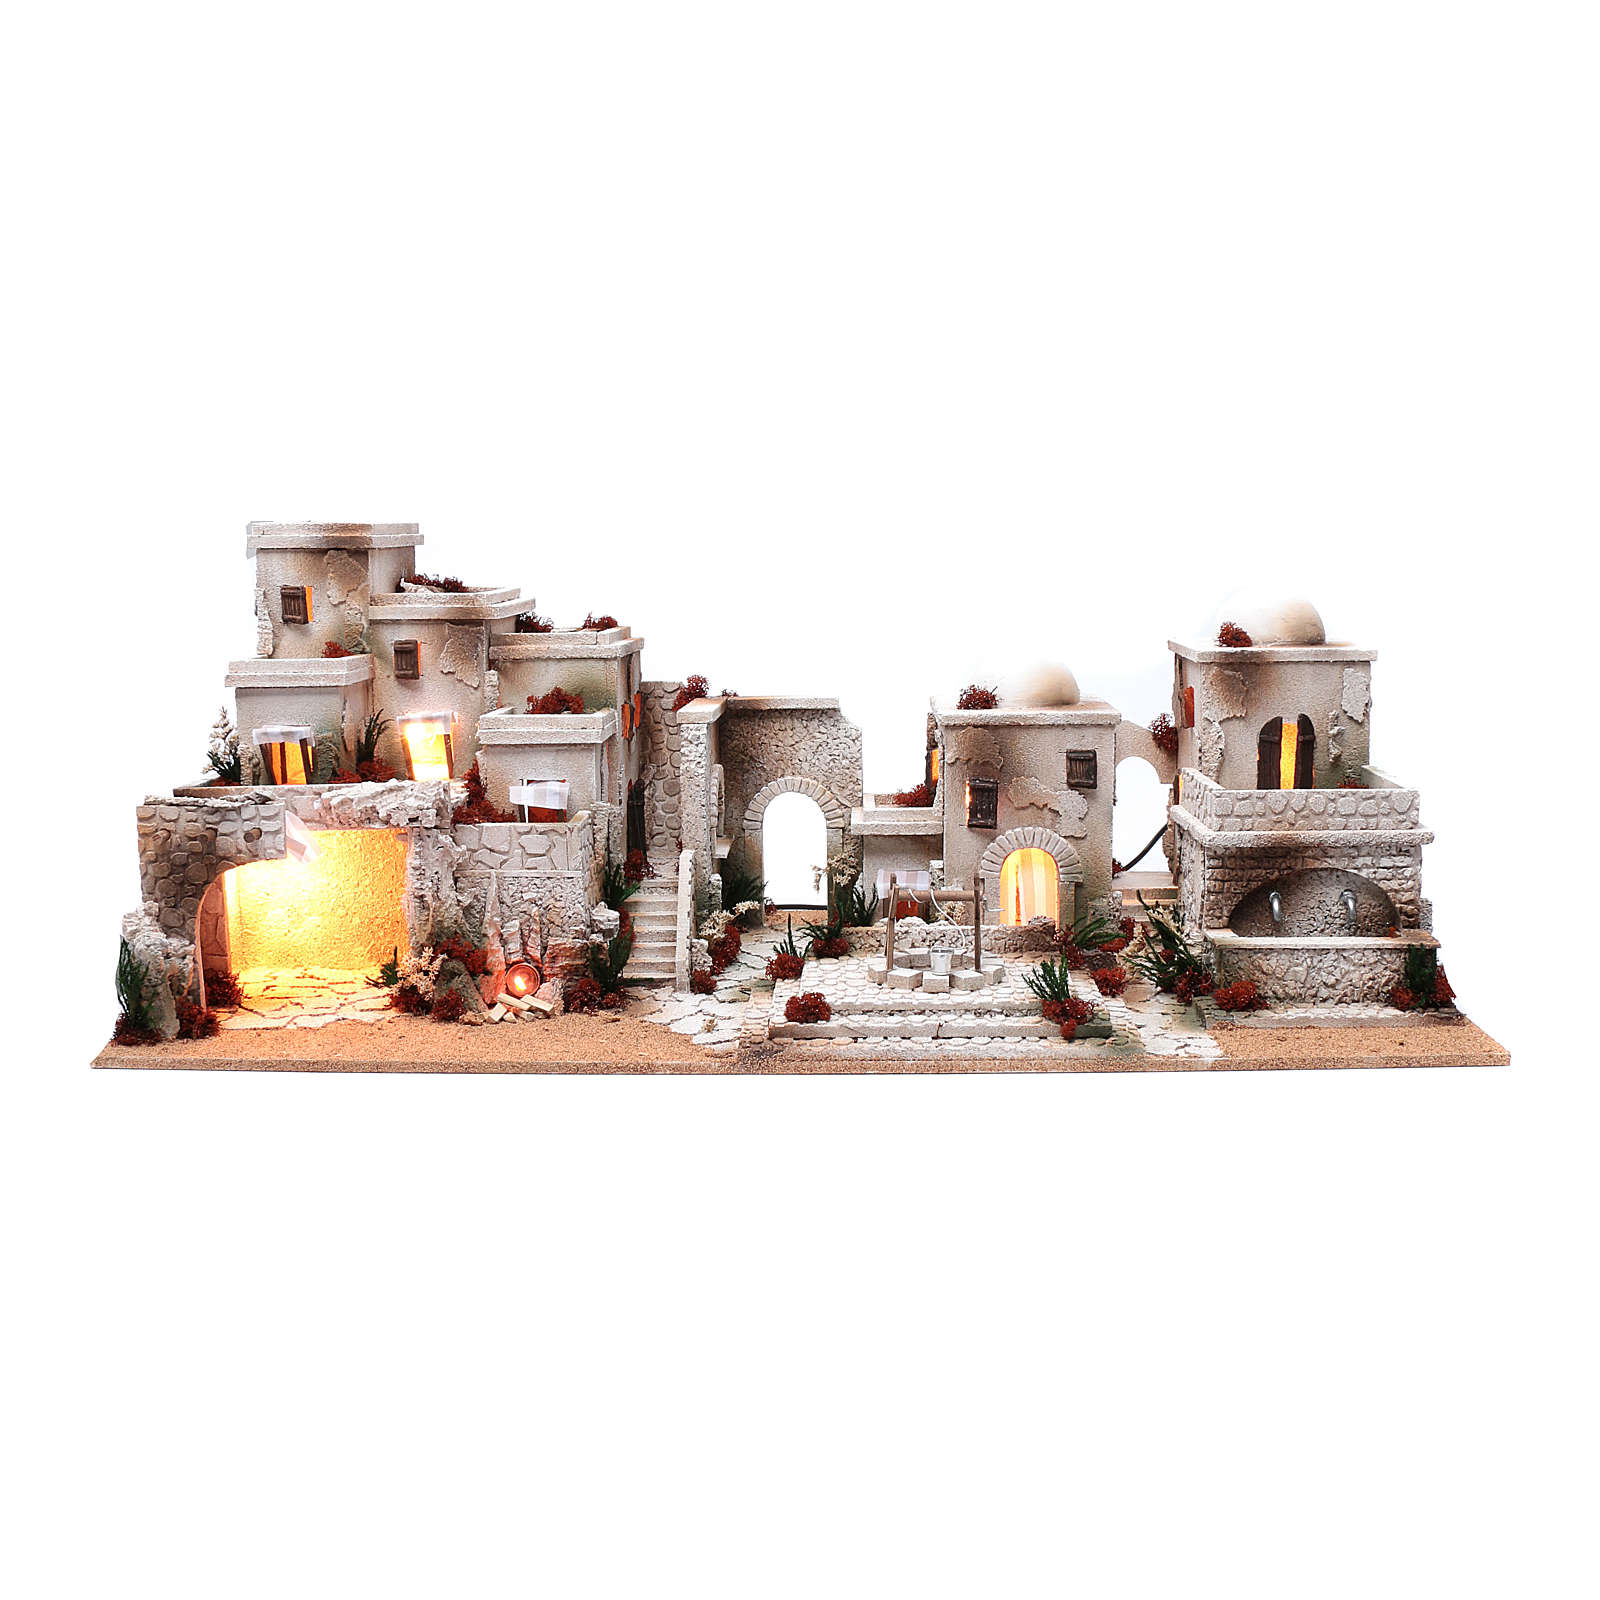 Ambientazione presepe stile arabo 35x95x45 cm luce e fontana 4